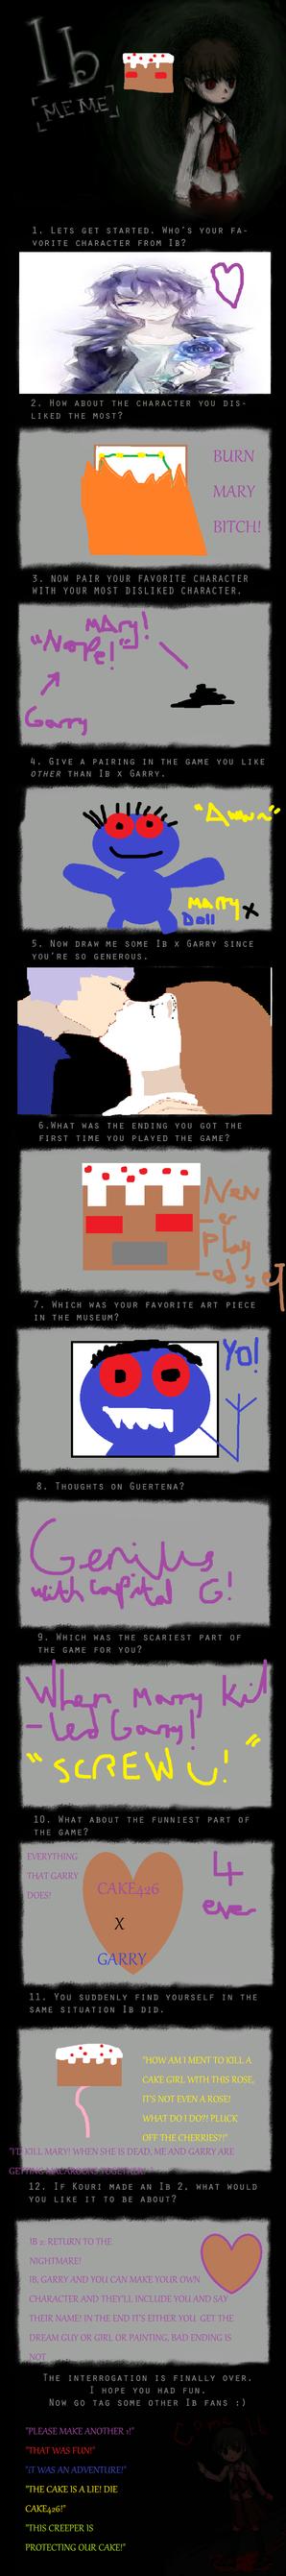 Me Ib cake thing! ~Look what I found!~ by Nightmarecake4268